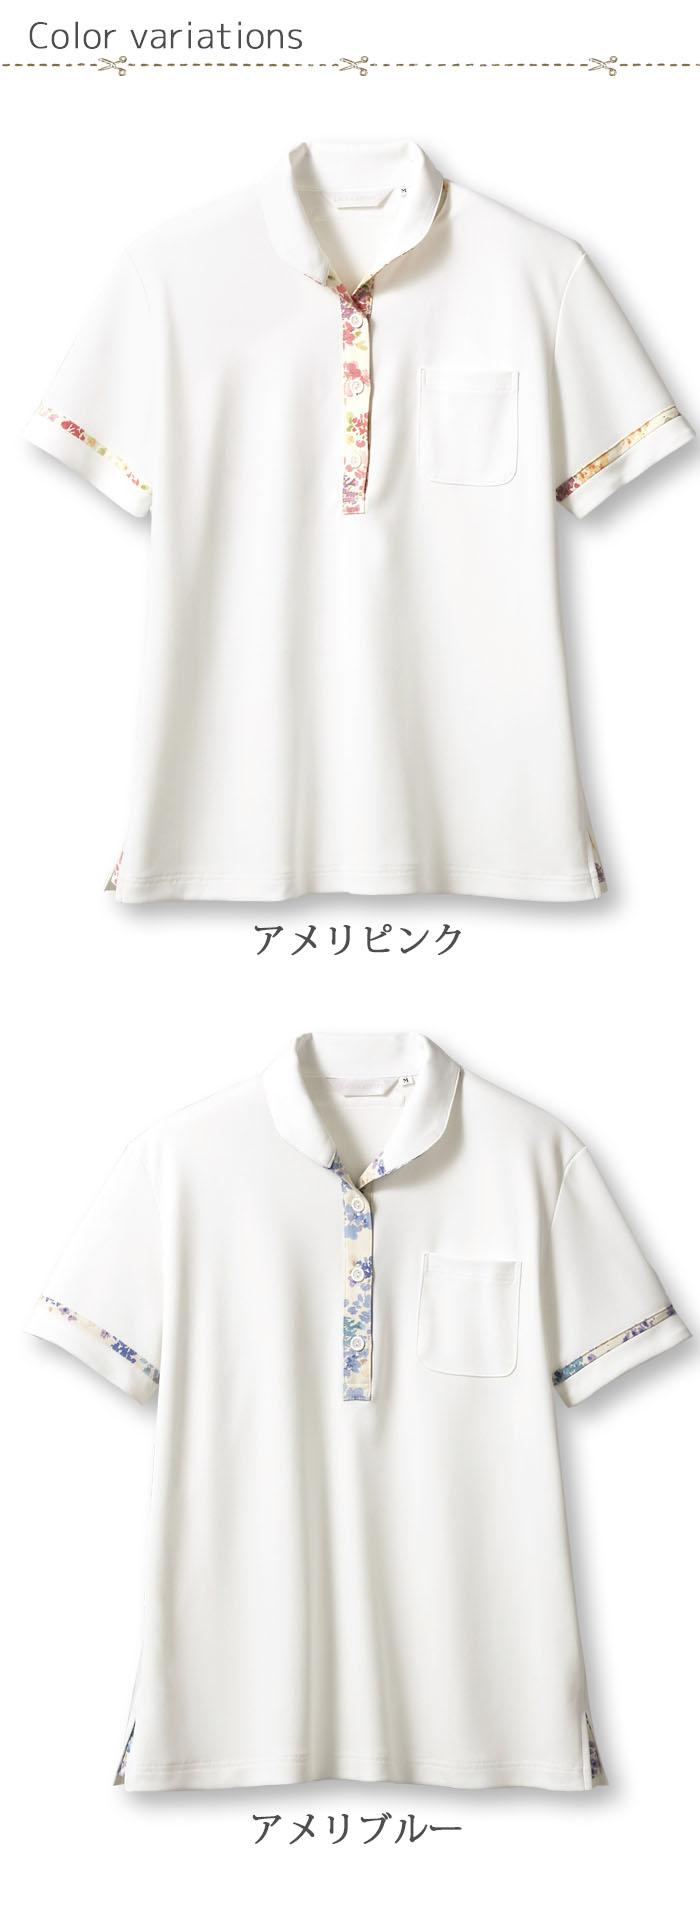 LW201 ニットシャツ カラー画像